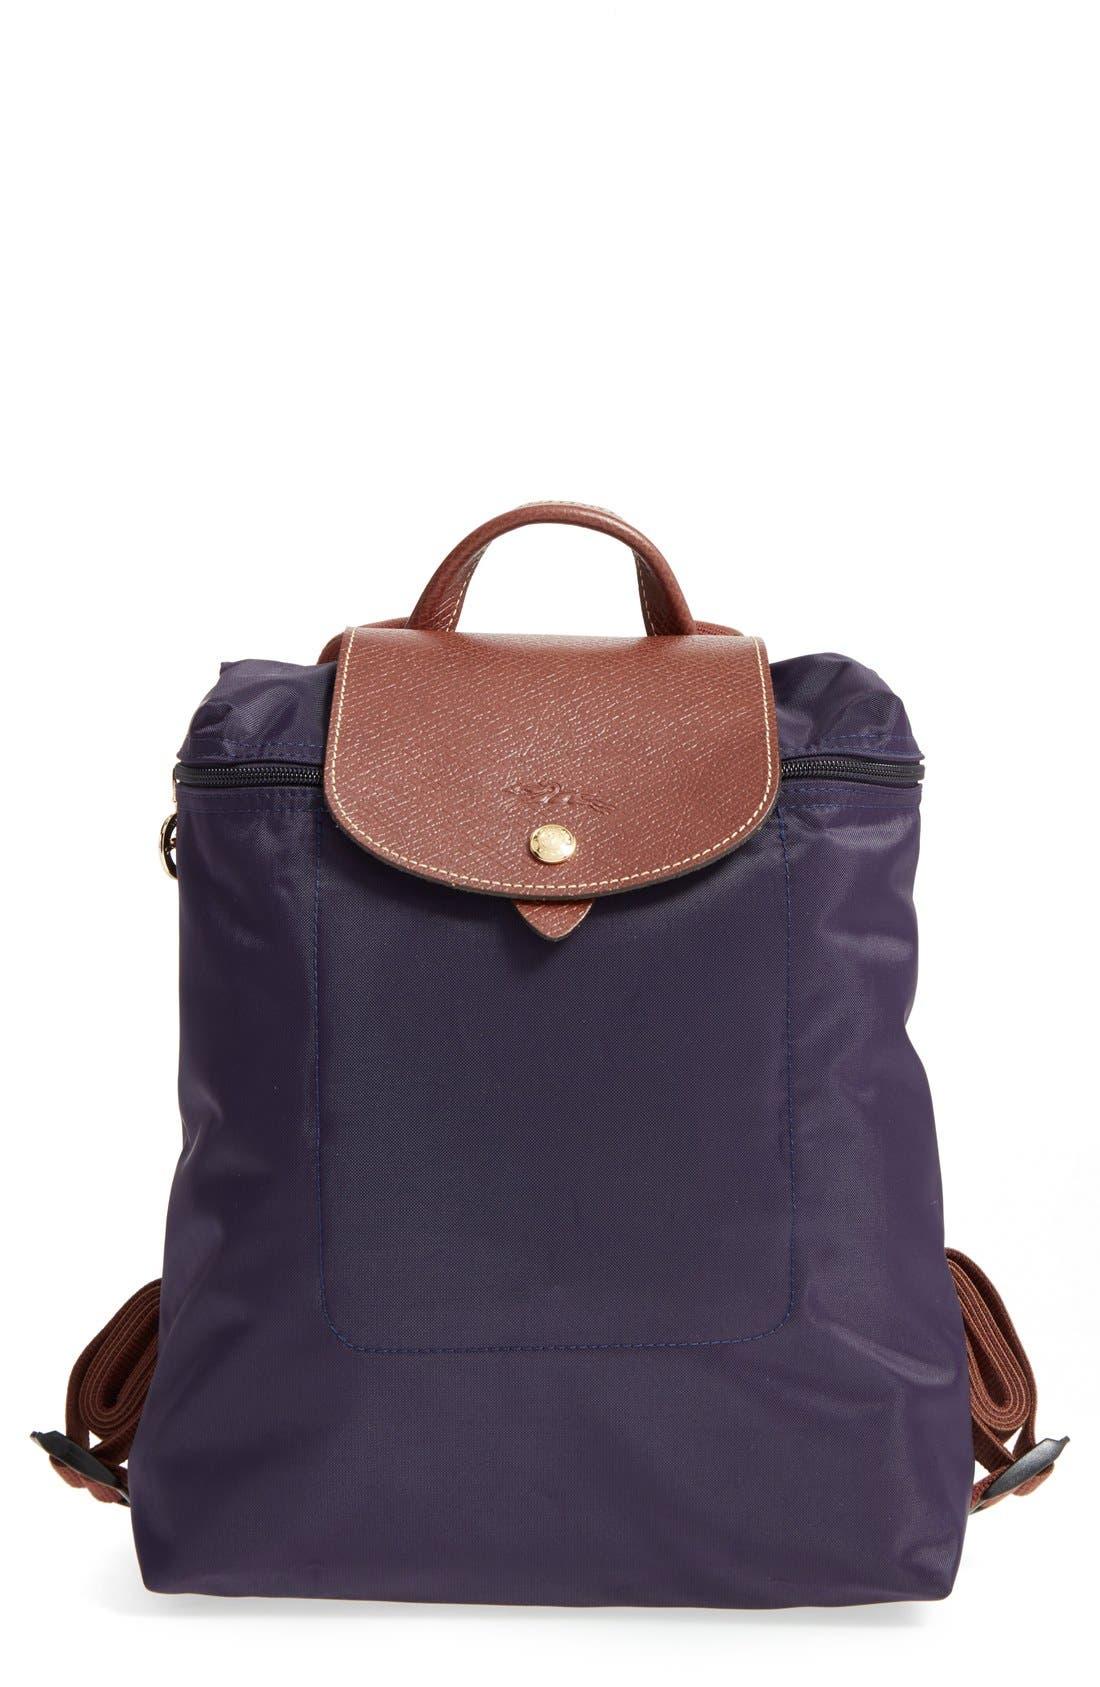 Online Discount Portable Backpack Longchamp Le Pliage Chocolate